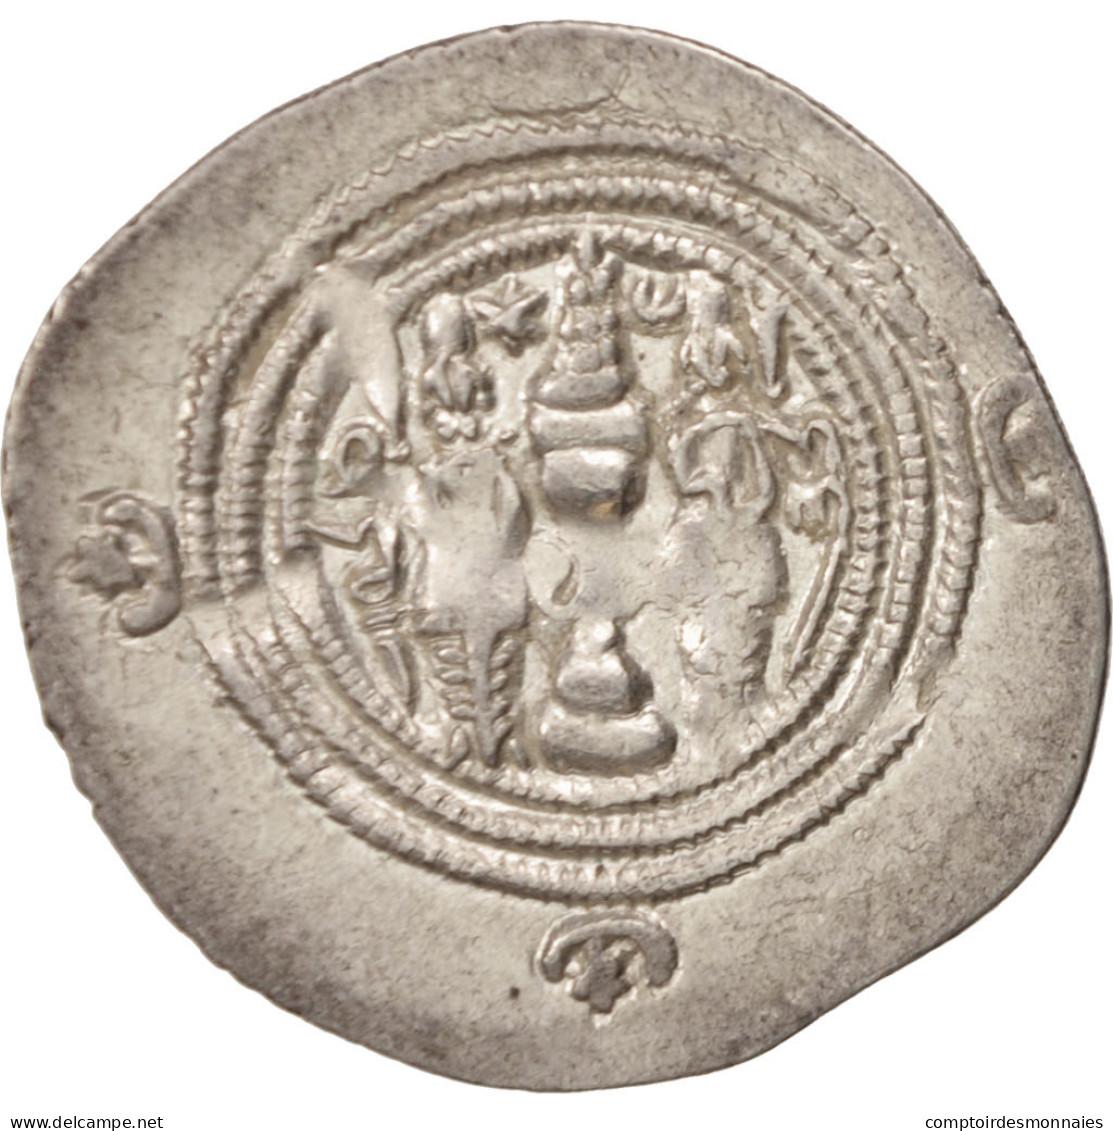 Xusros II, Drachm, 630 AD, TTB, Argent - Orientales